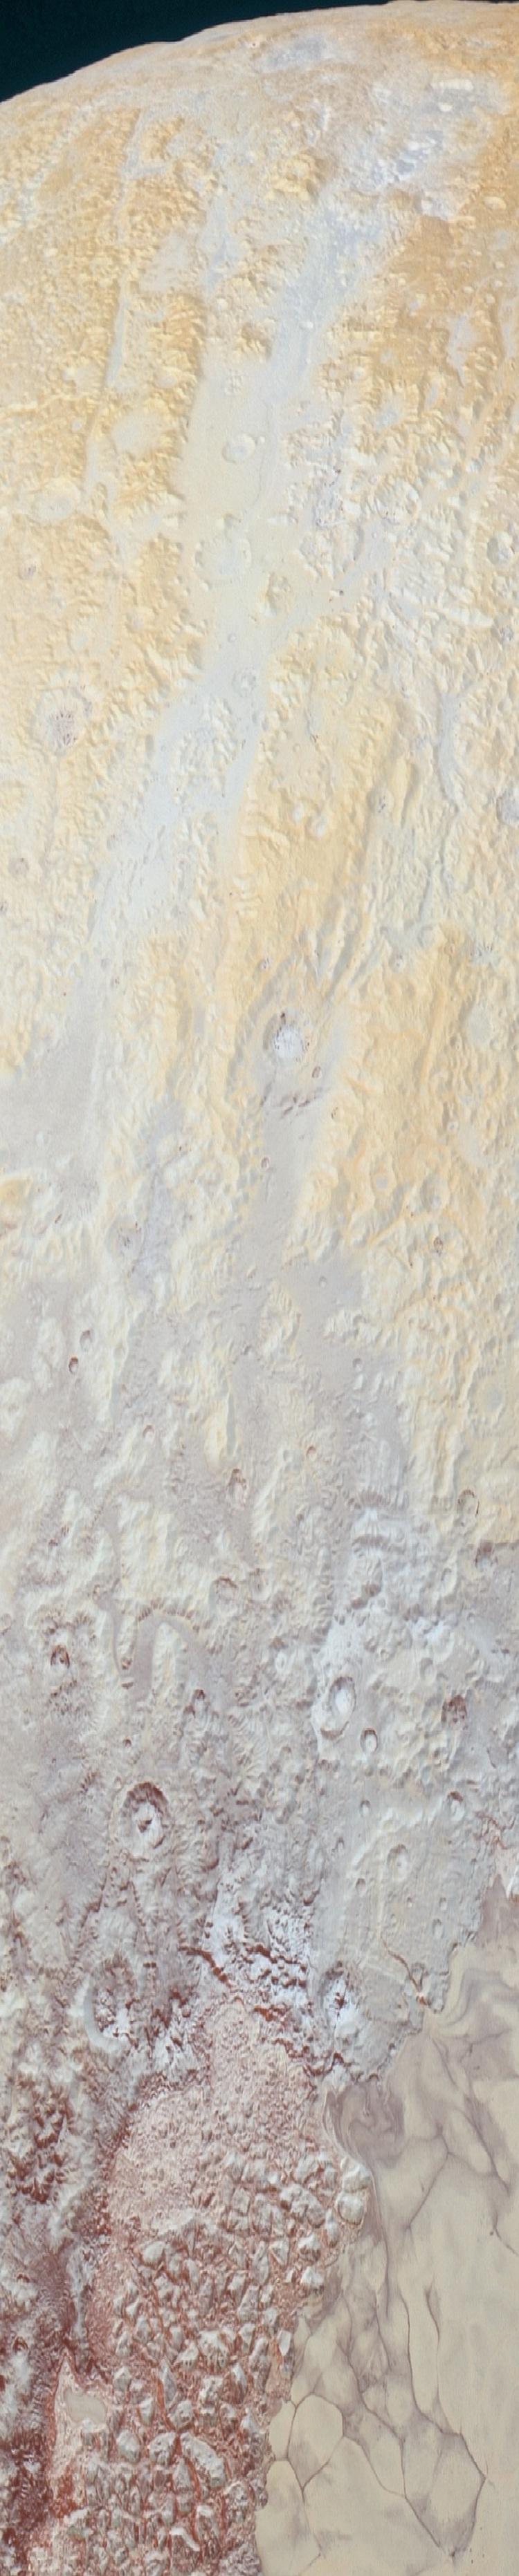 crop_p_color2_enhanced_release Nasa Pluto (2)